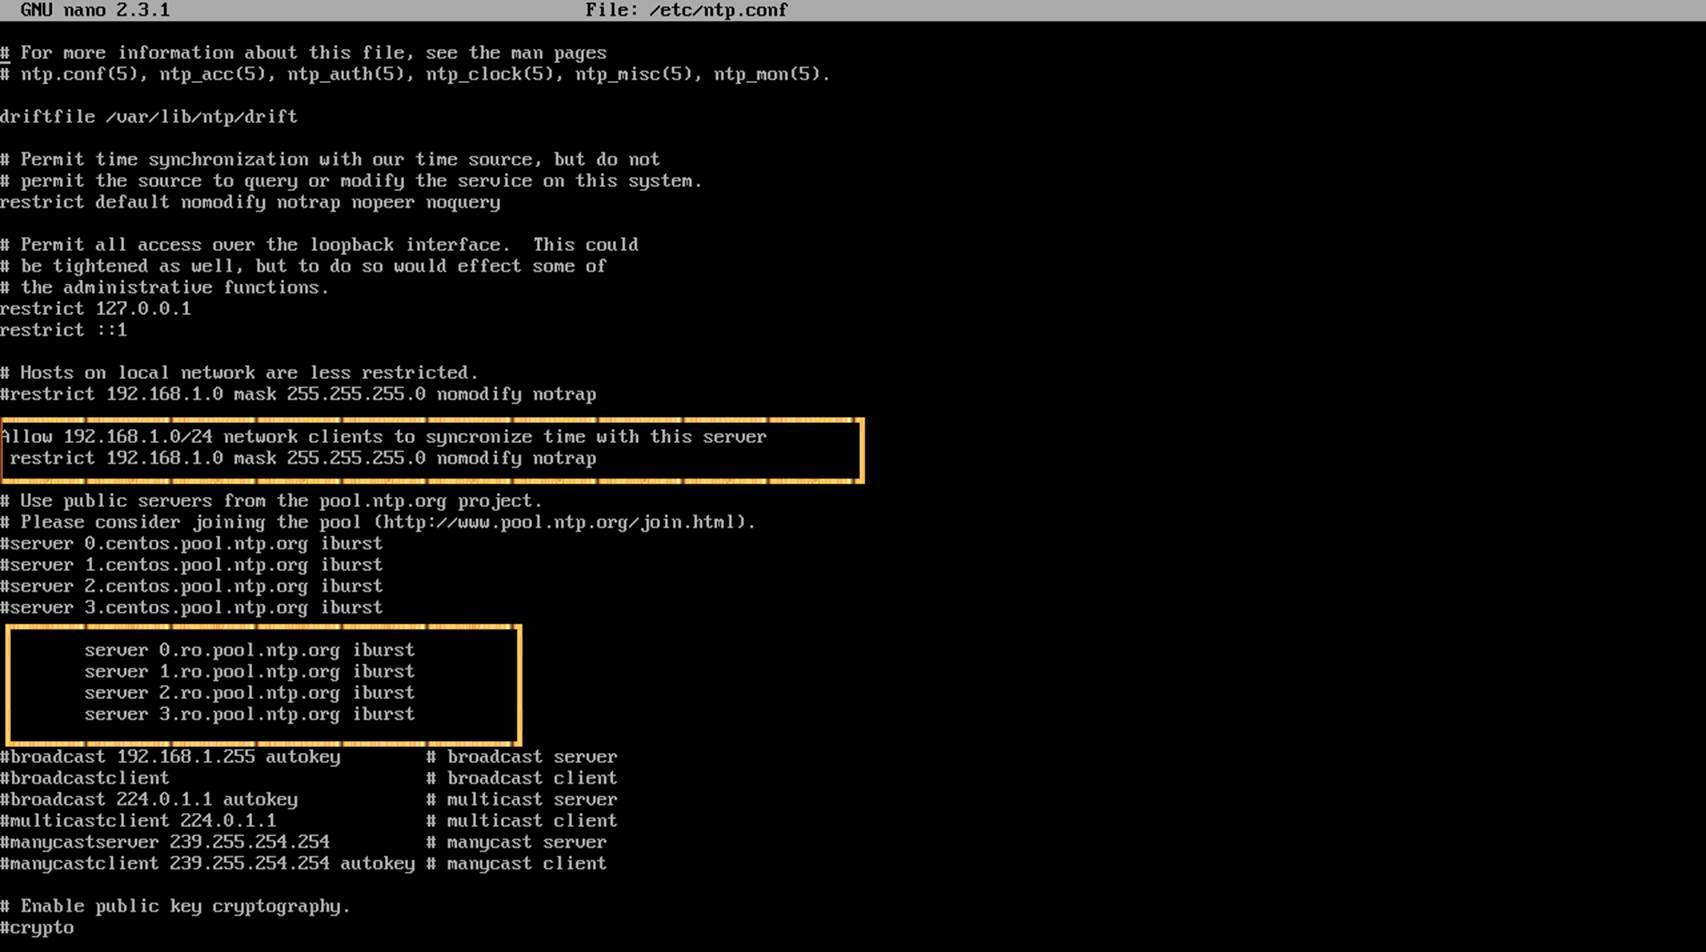 how to find rhel version on unix